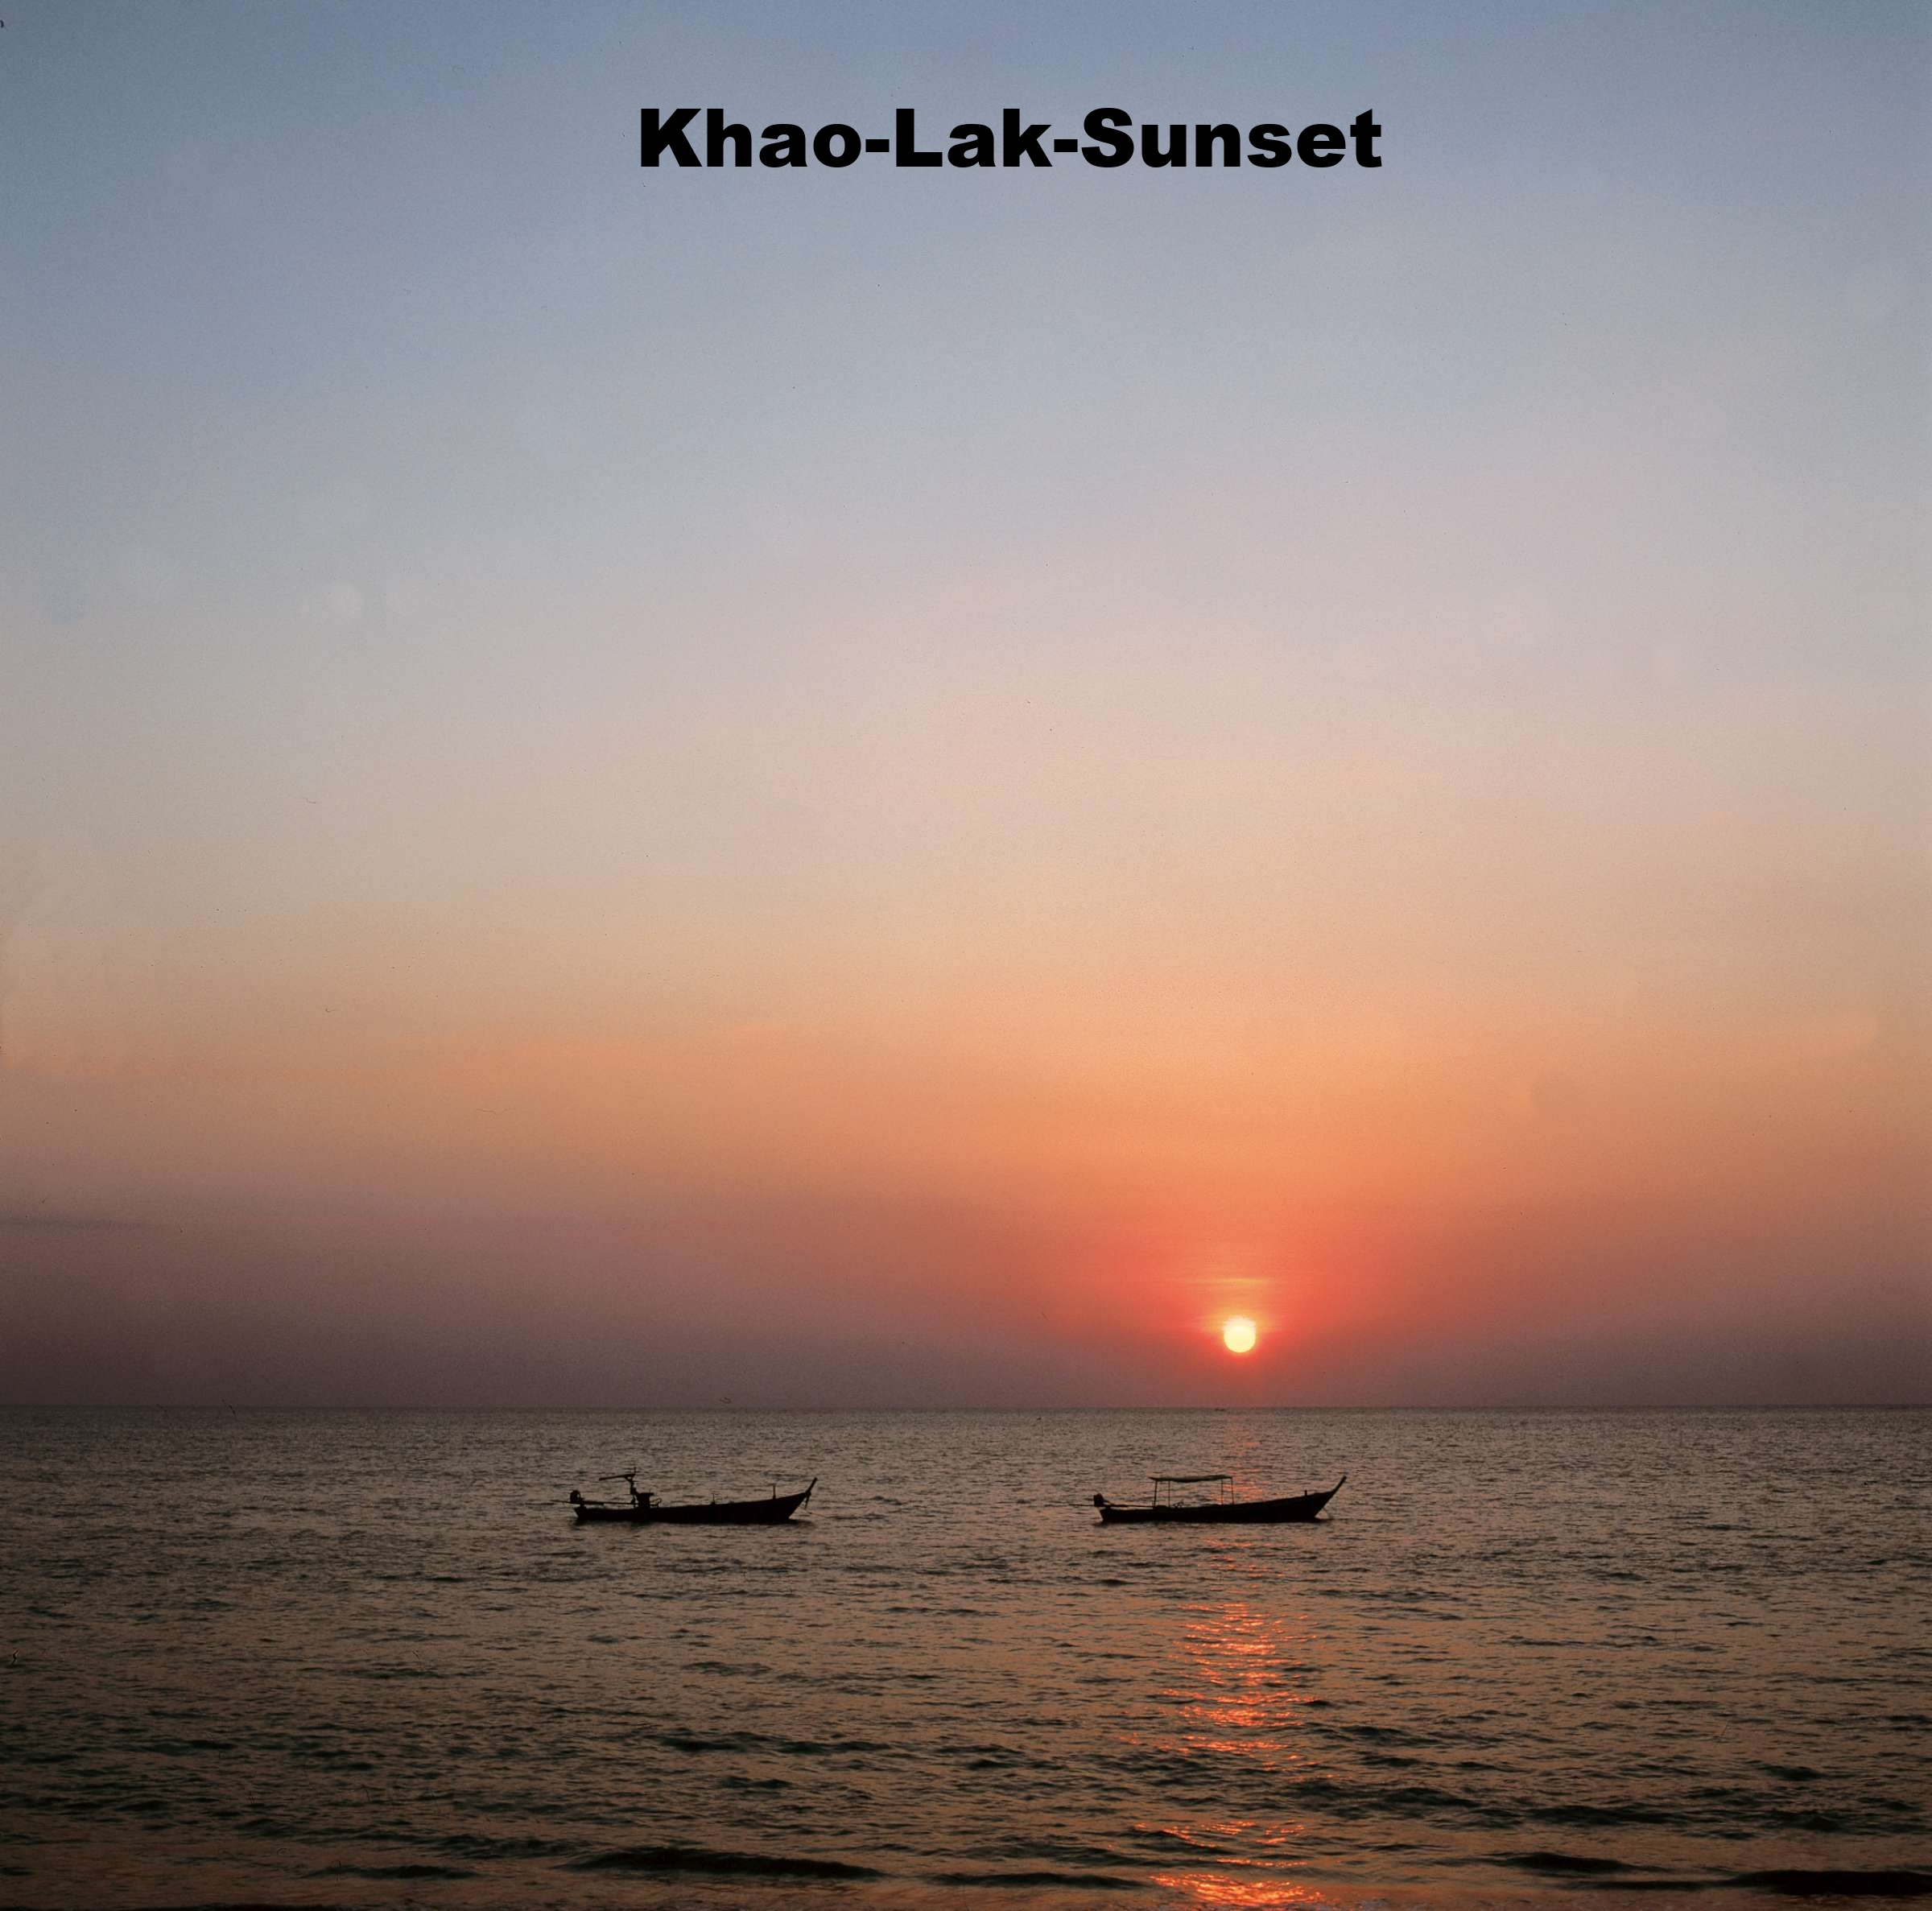 khao-lak-sunset.jpg